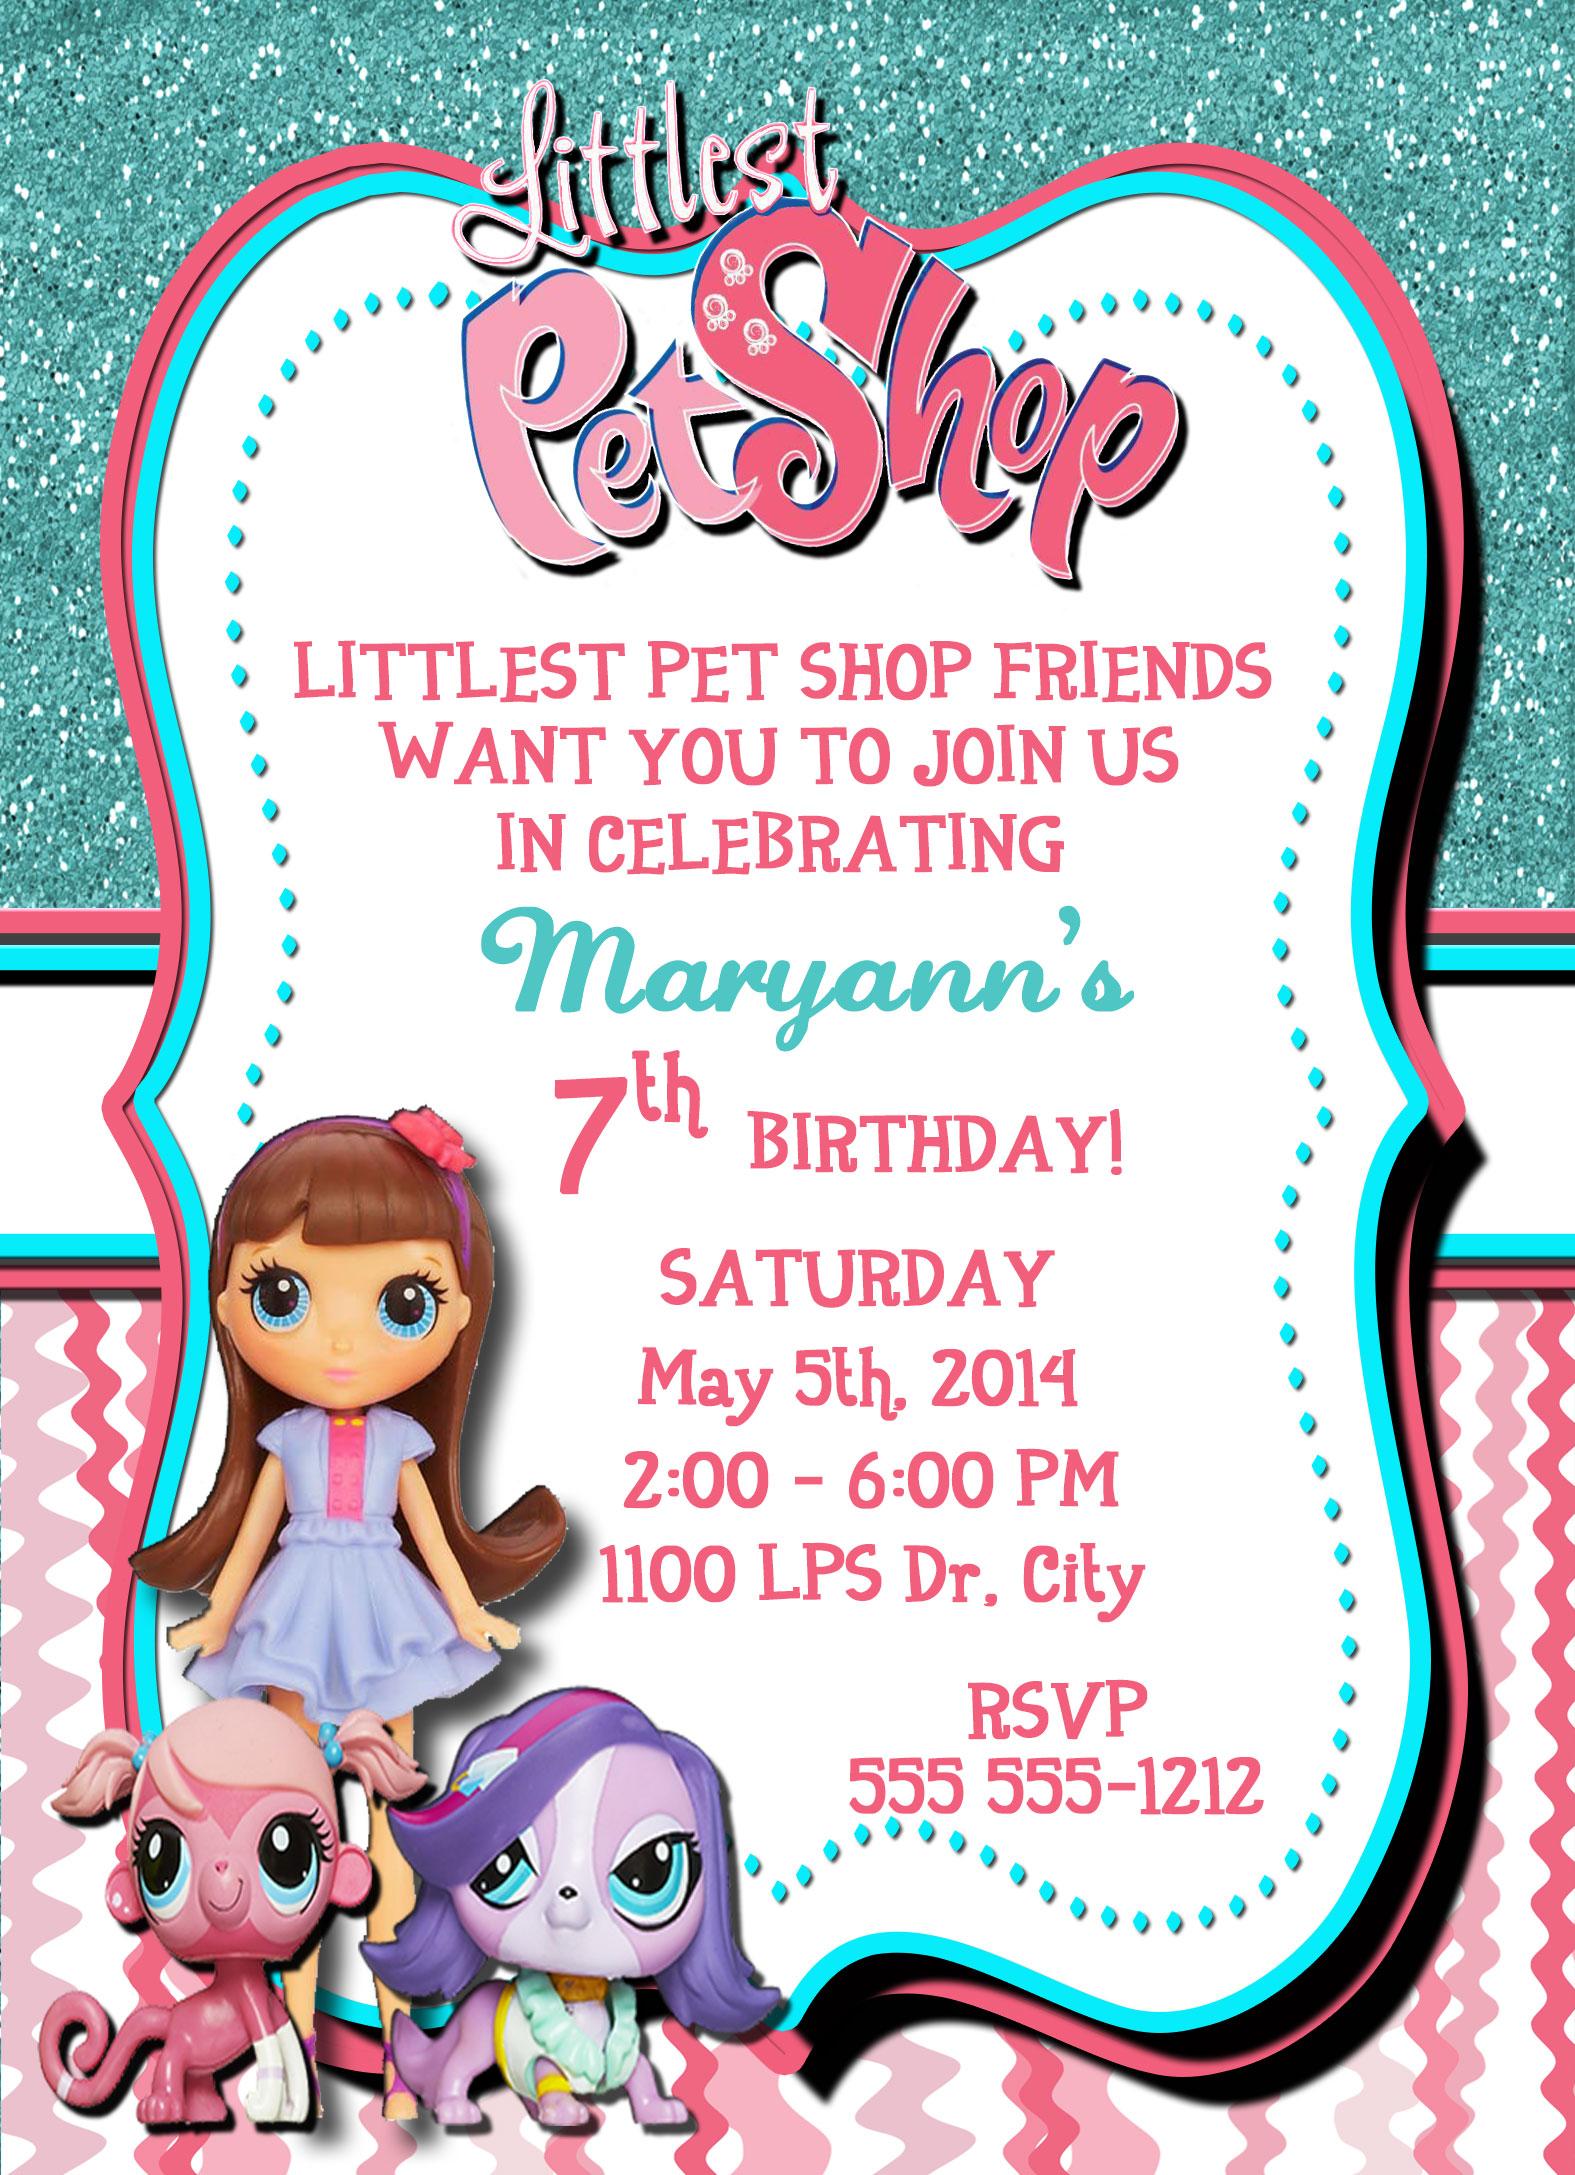 Littlest Pet Shop Personalized Birthday Invitation 1 Sided Birthday